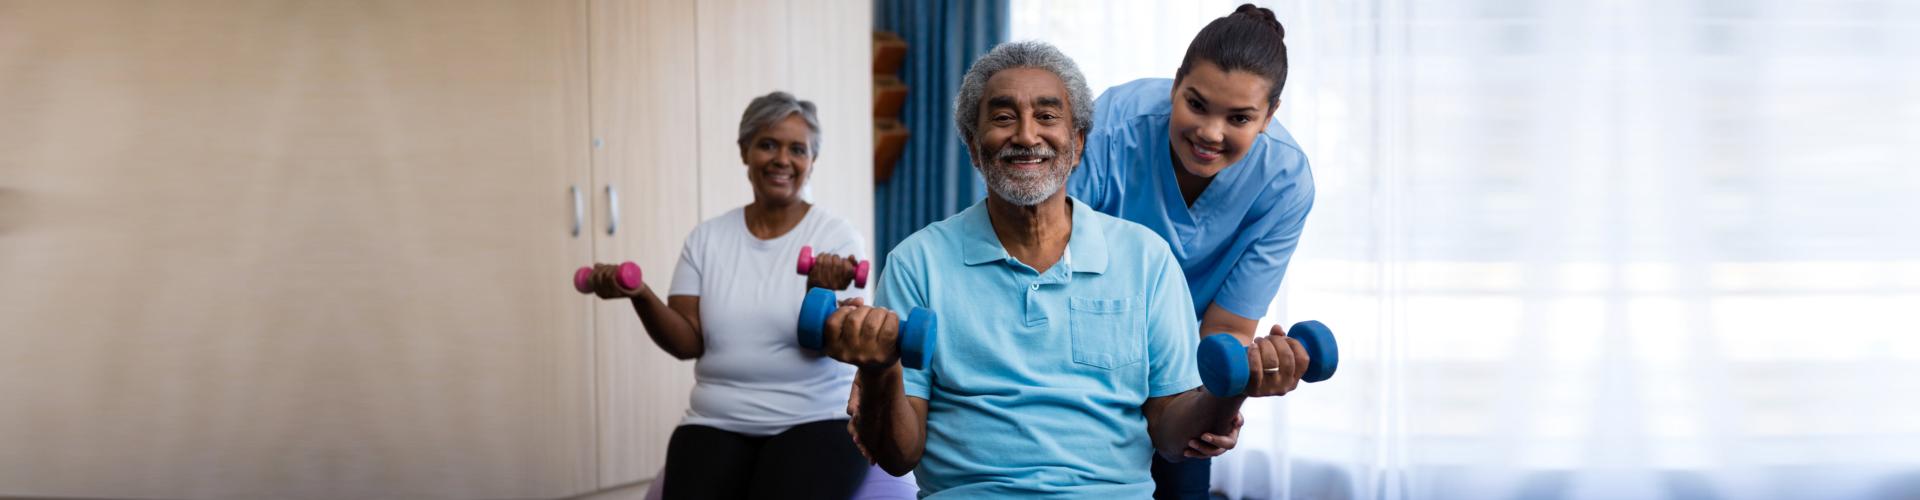 Portrait of nurse training seniors in lifting dumbbells at nursing home